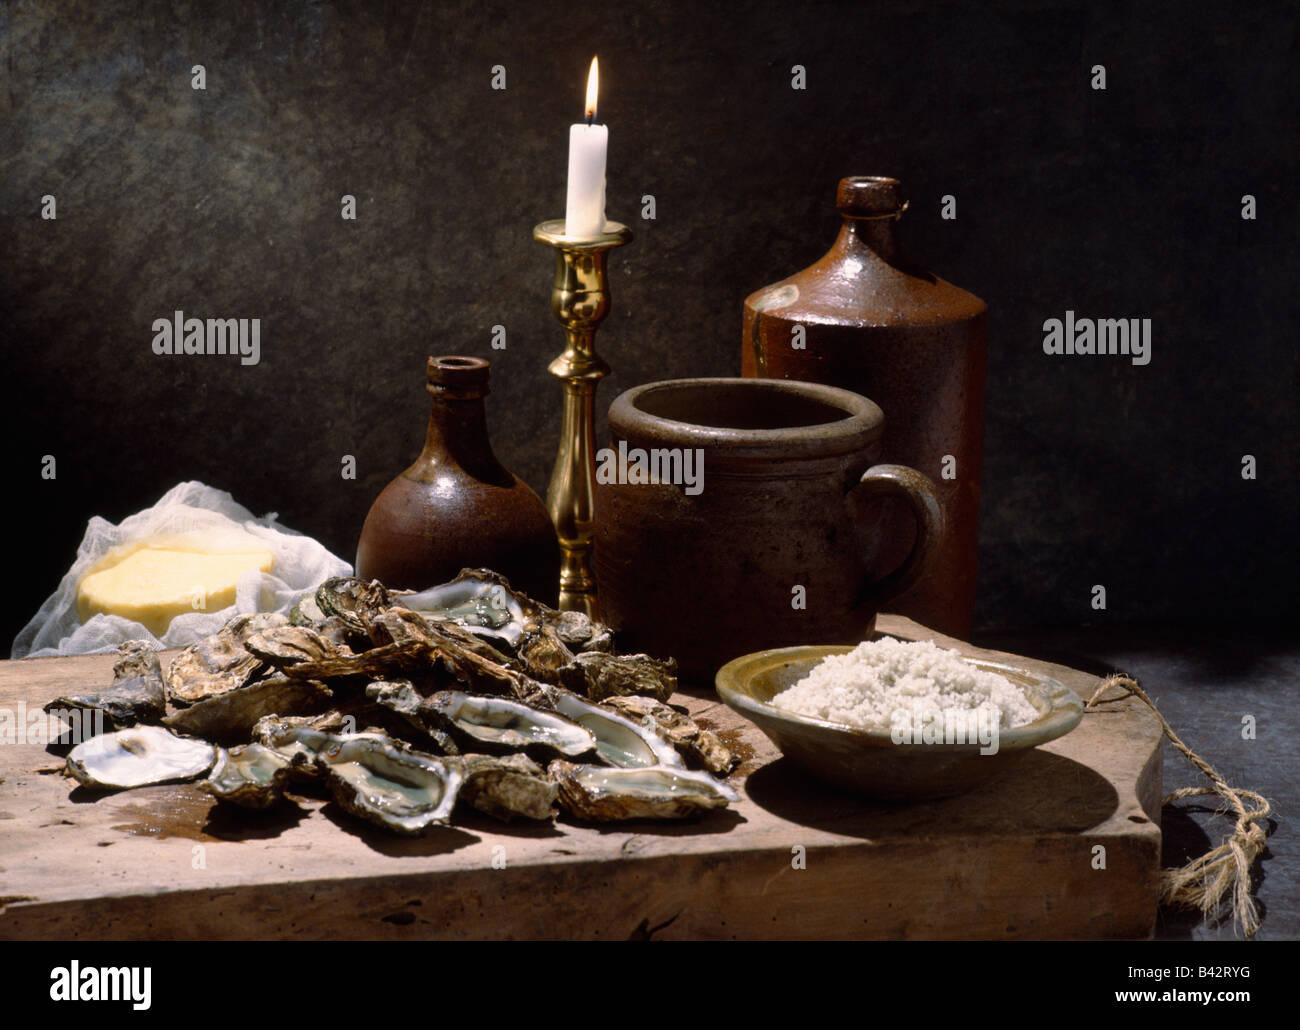 Stillleben mit Austern Stockbild